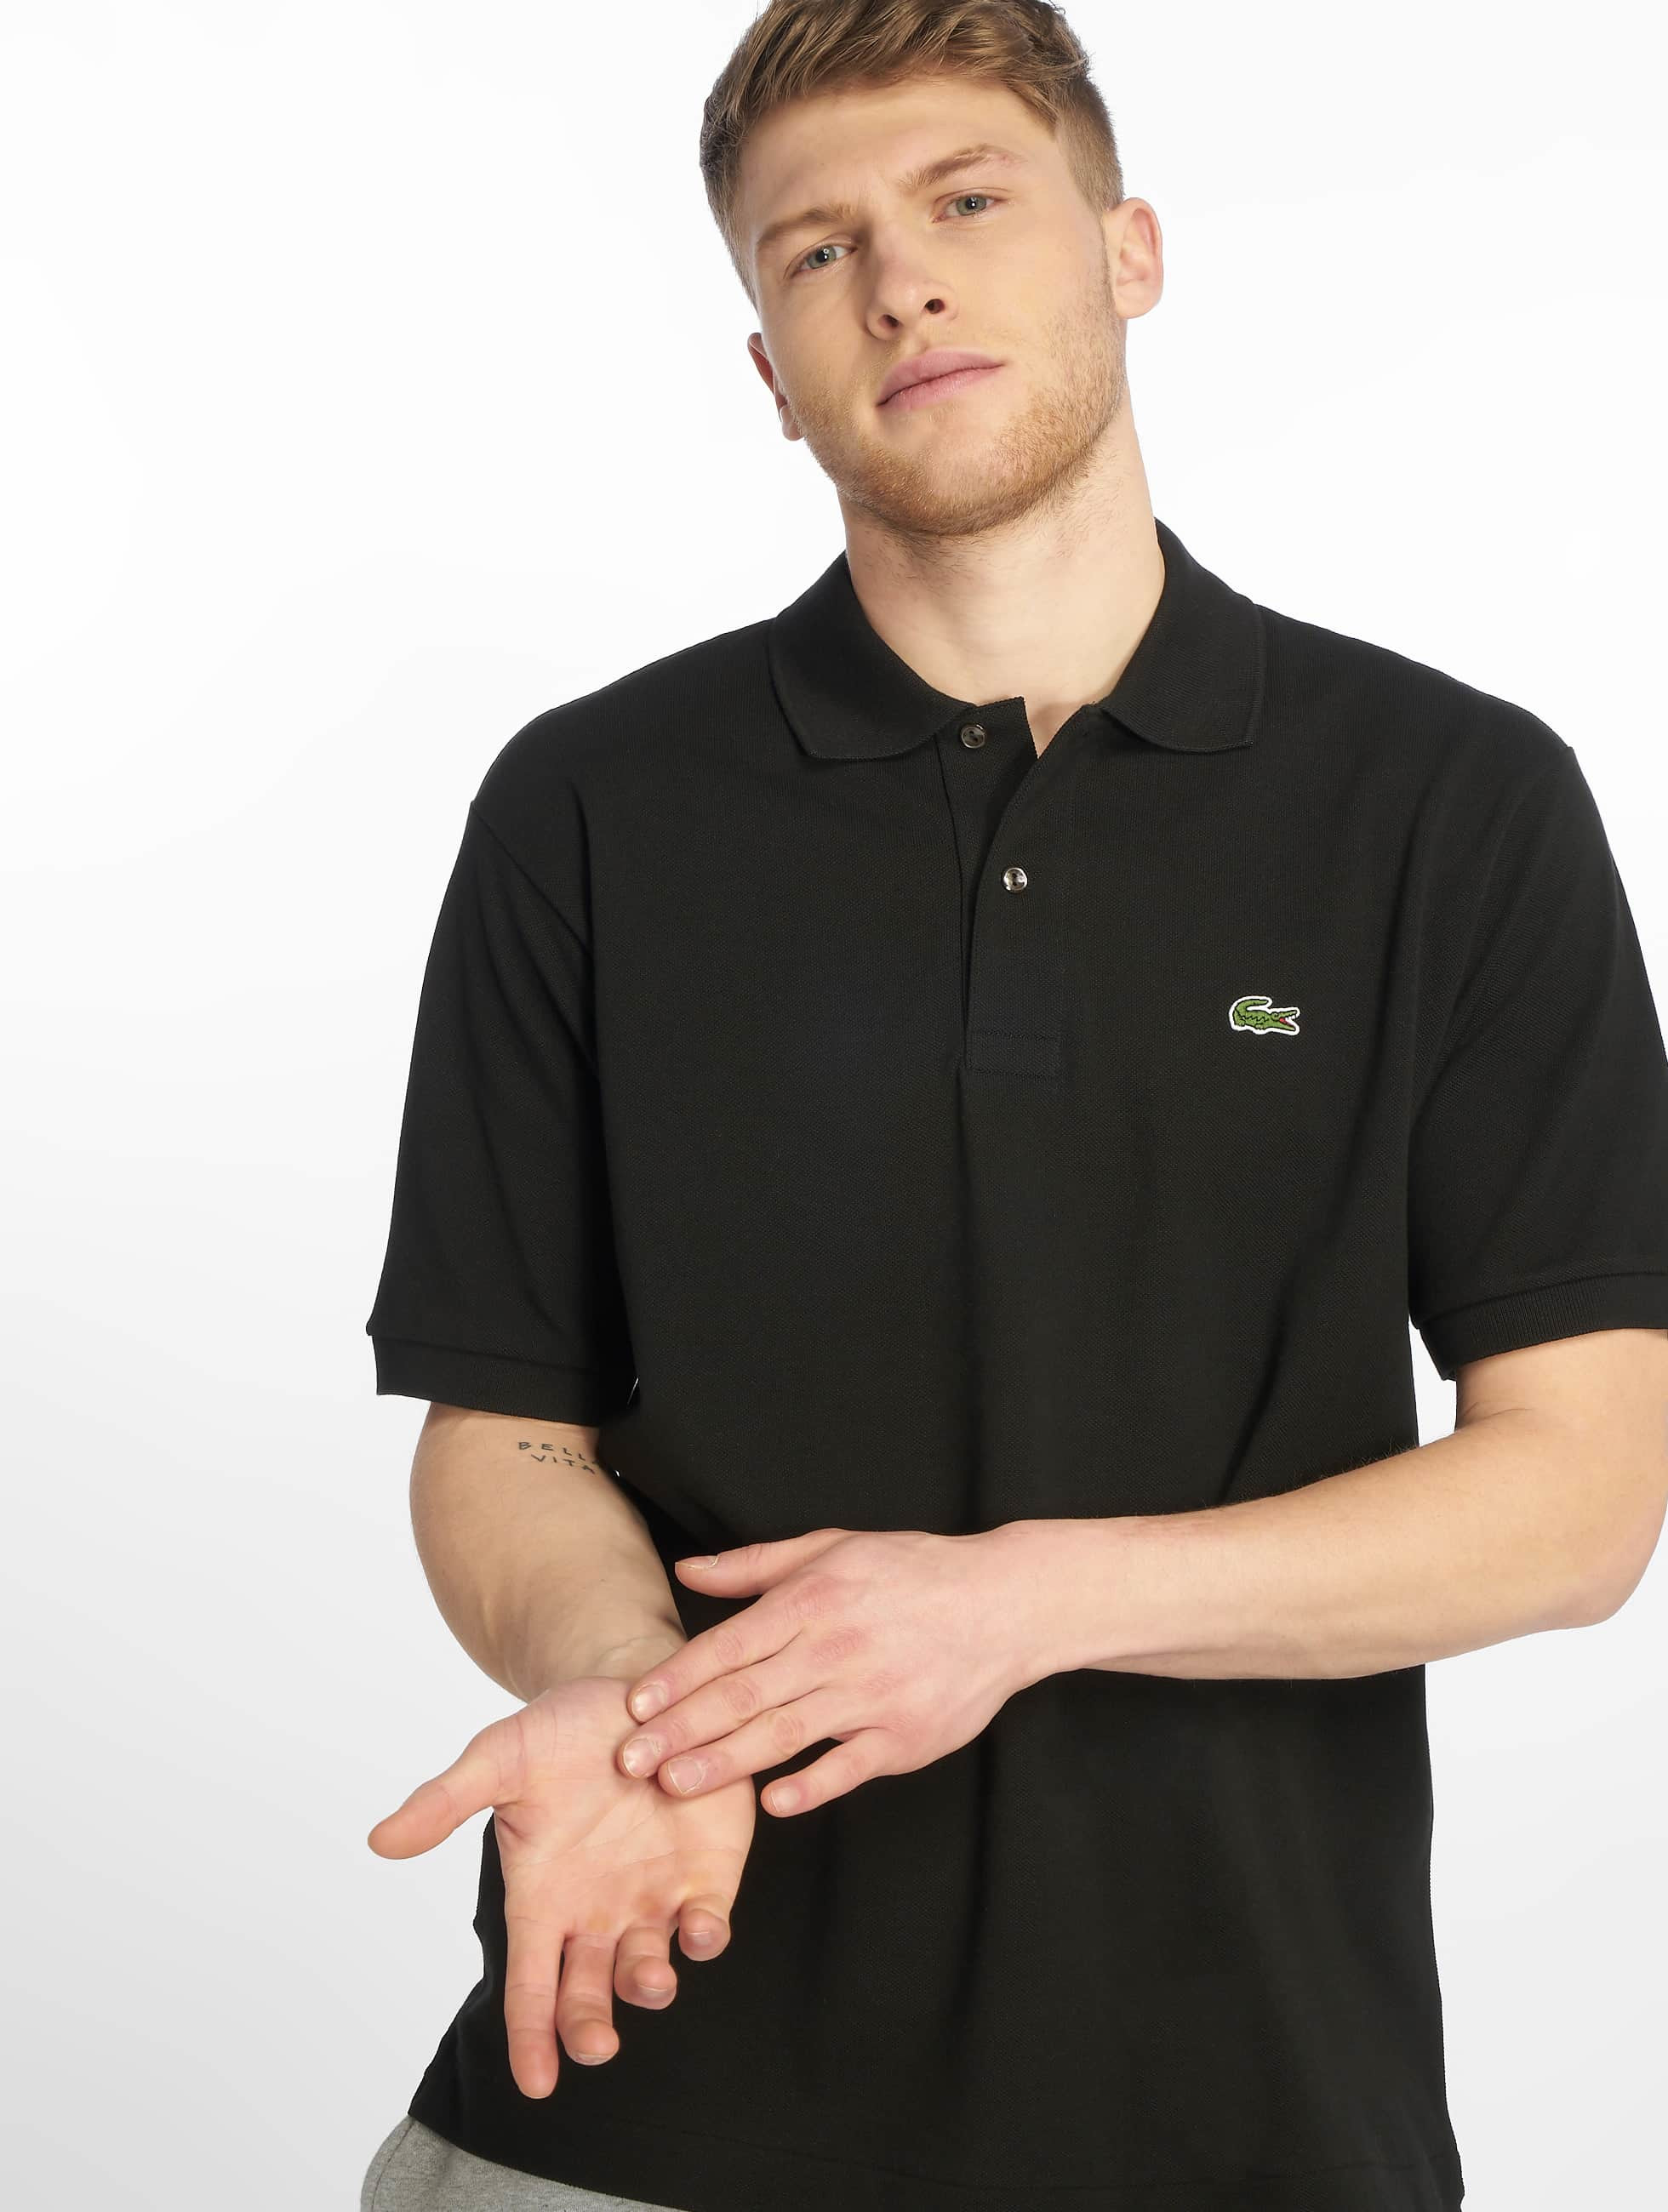 Lacoste Classic Männer Poloshirt Basic in schwarz